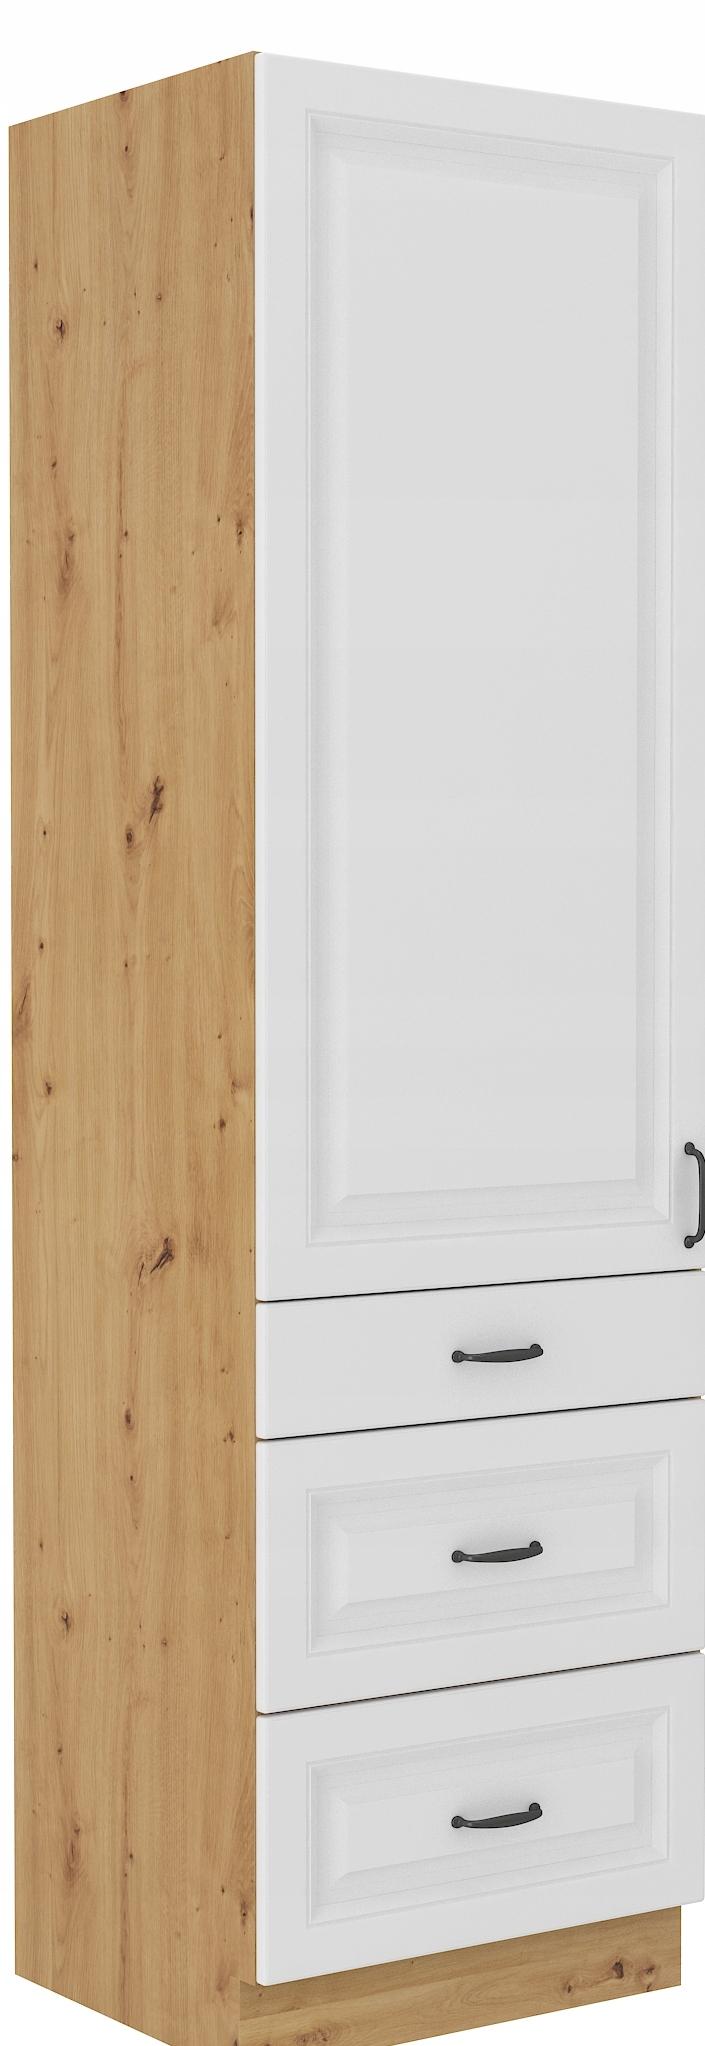 RETRO vysoká skrinka 60 cm remeselník + biela